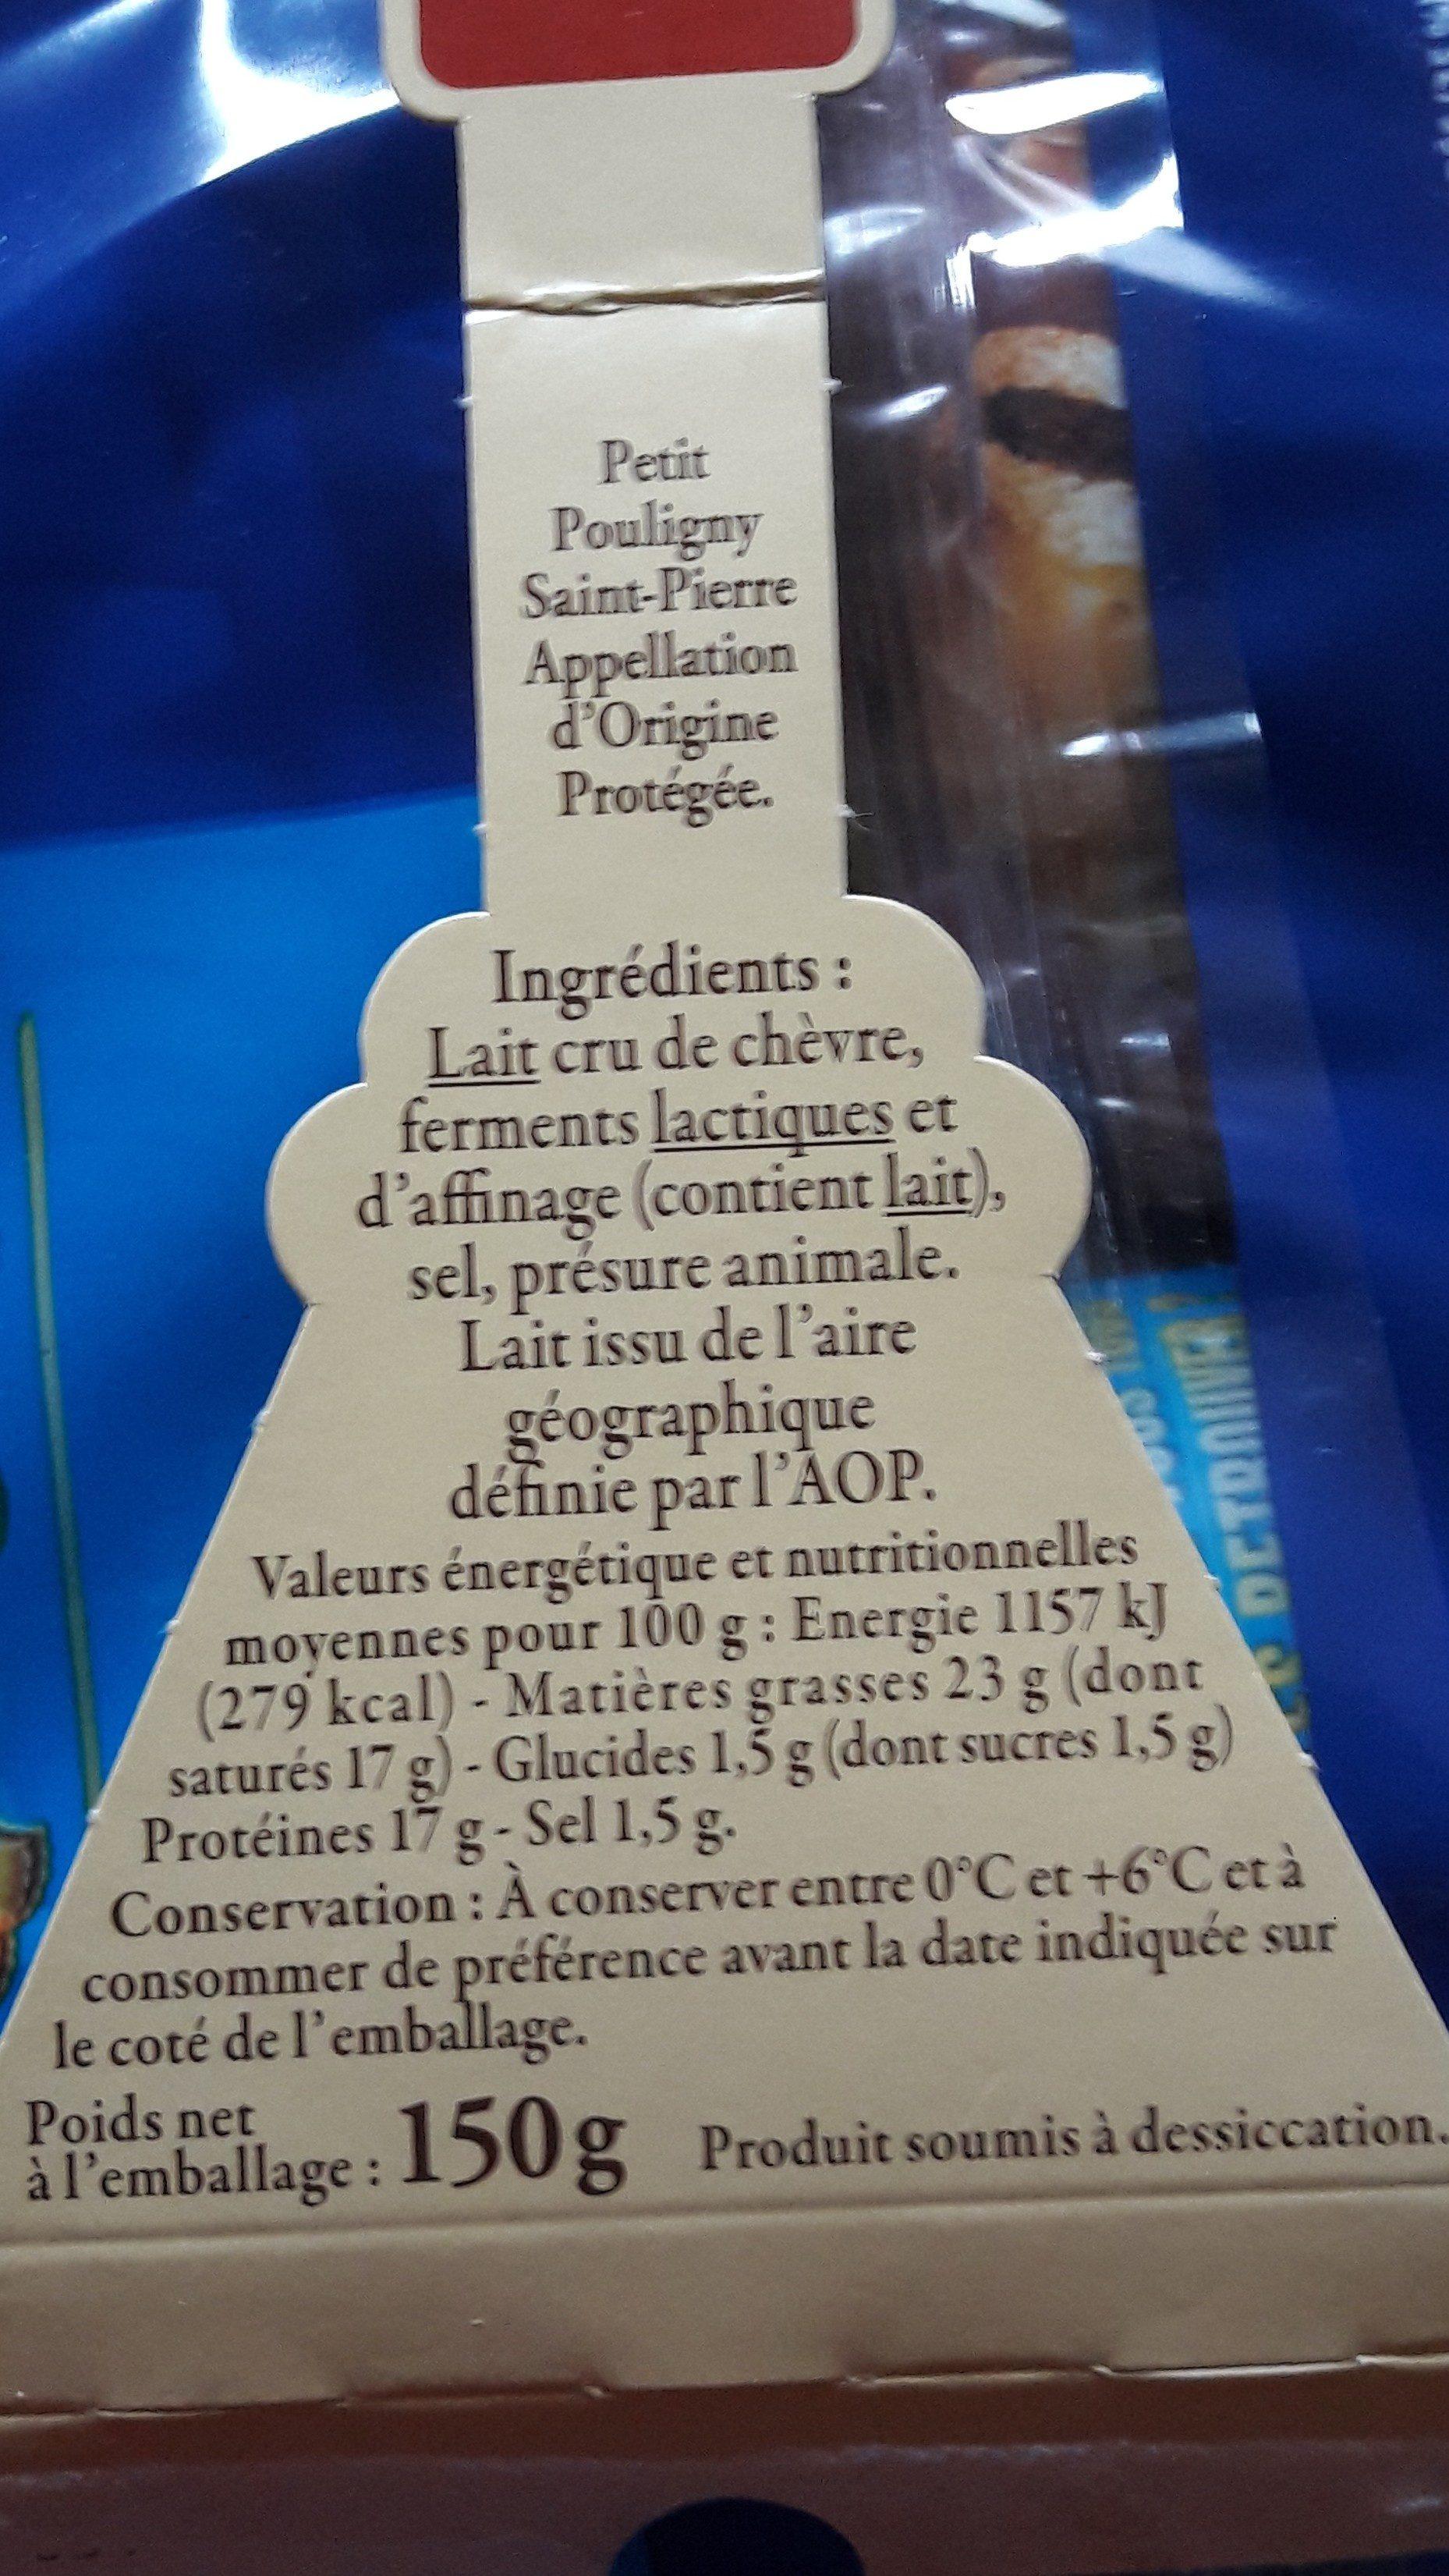 Fromage De Chèvre Au Lait Cru - Ingrediënten - fr